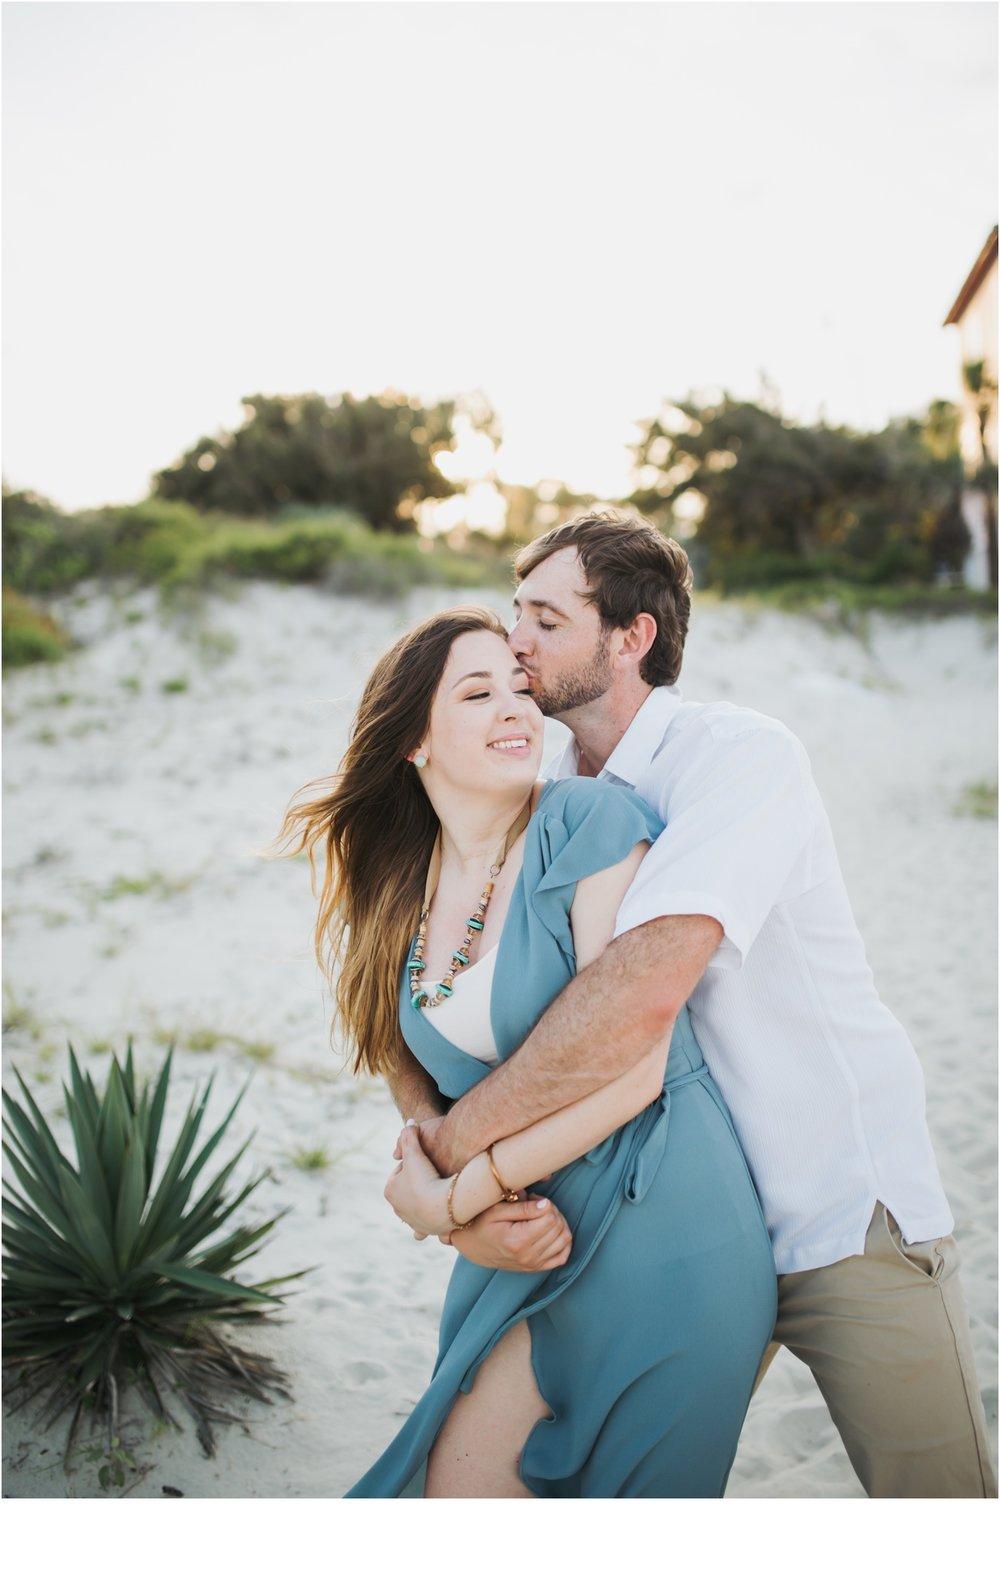 Rainey_Gregg_Photography_St._Simons_Island_Georgia_California_Wedding_Portrait_Photography_1162.jpg